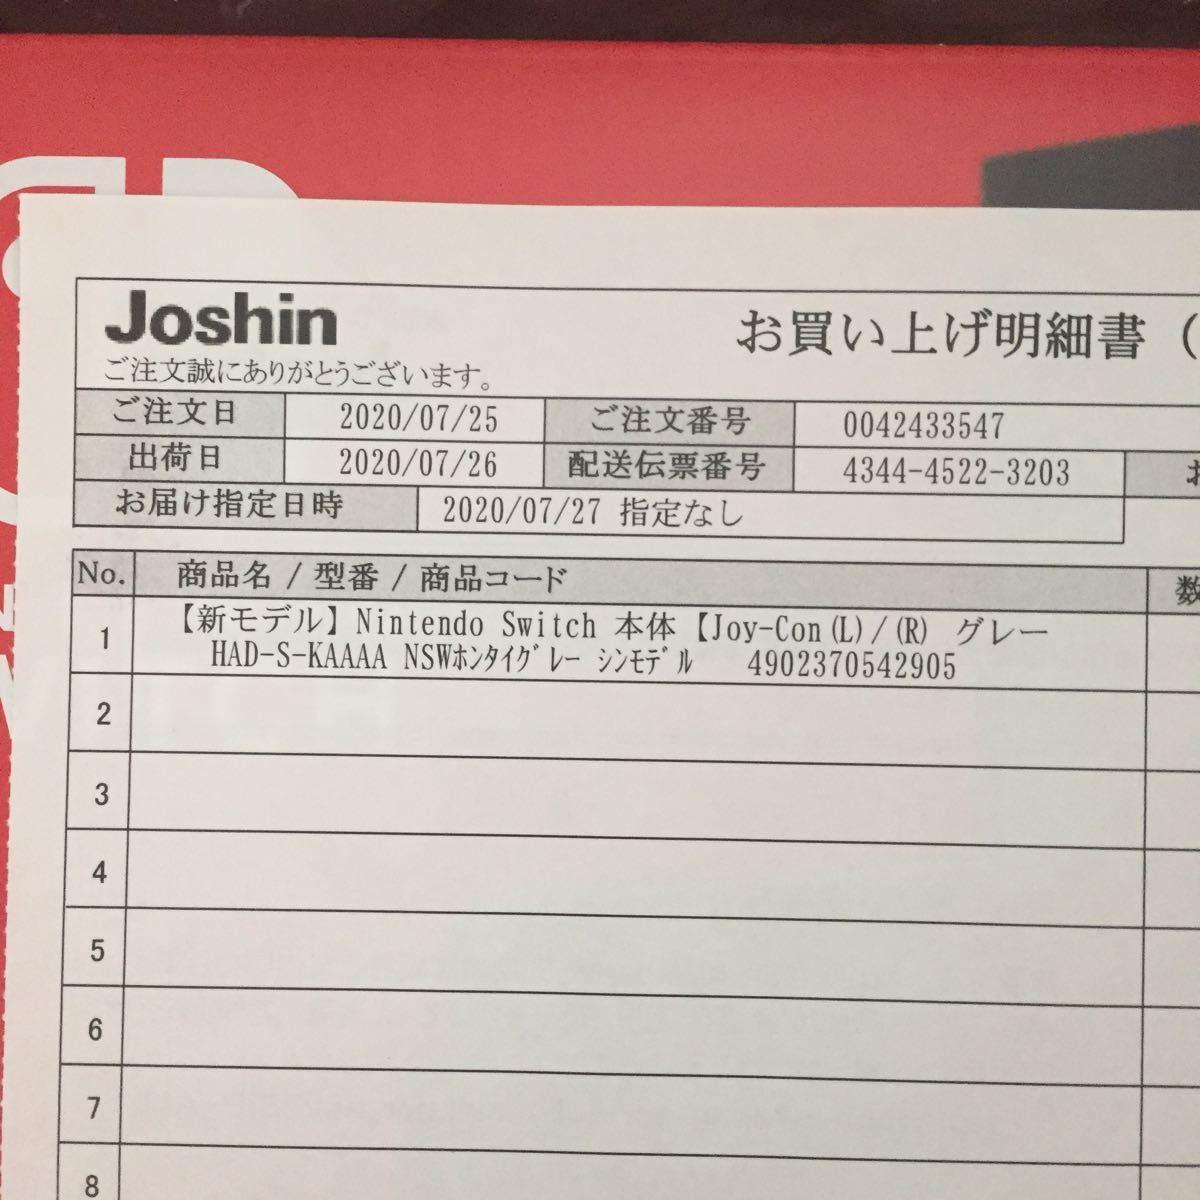 Nintendo Switch 任天堂 ニンテンドースイッチ 本体 Joy-Con (L) (R) グレー 新モデル 新品未開封_画像2